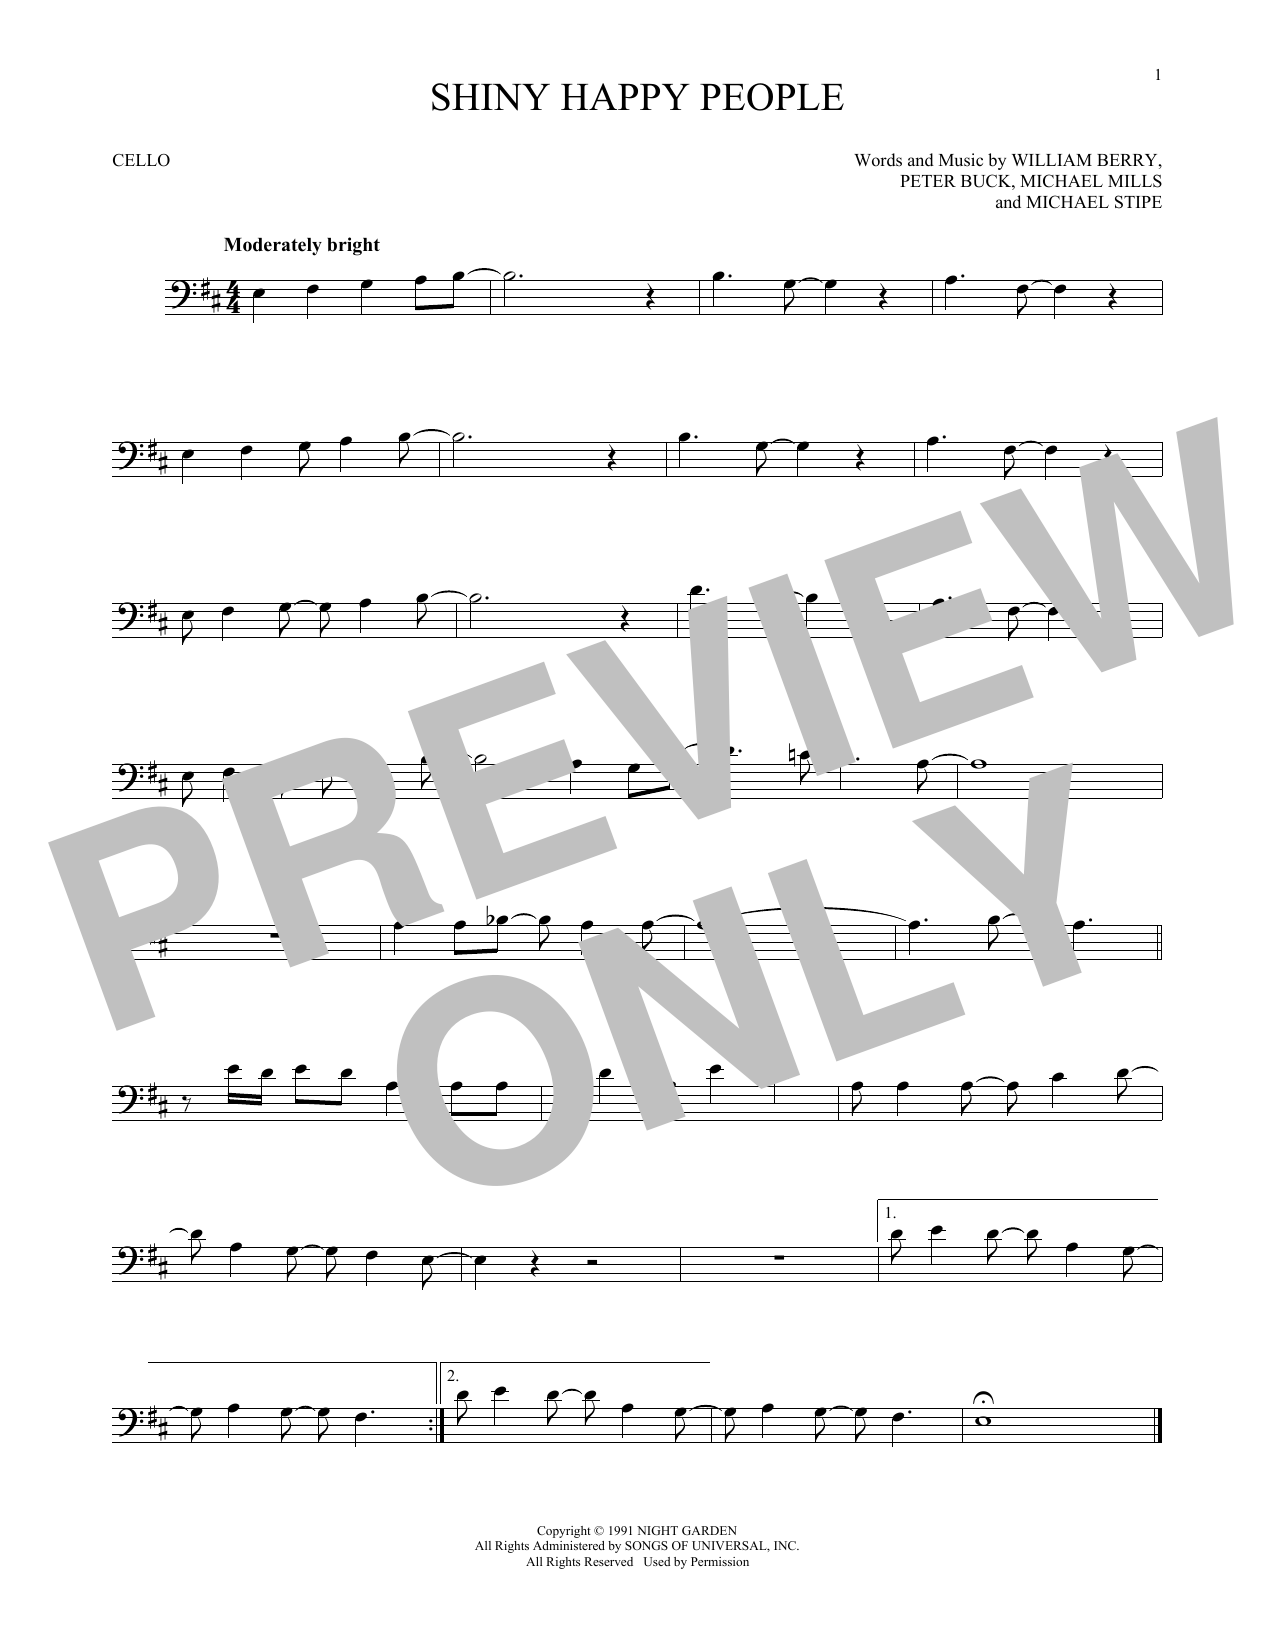 Shiny Happy People (Cello Solo)